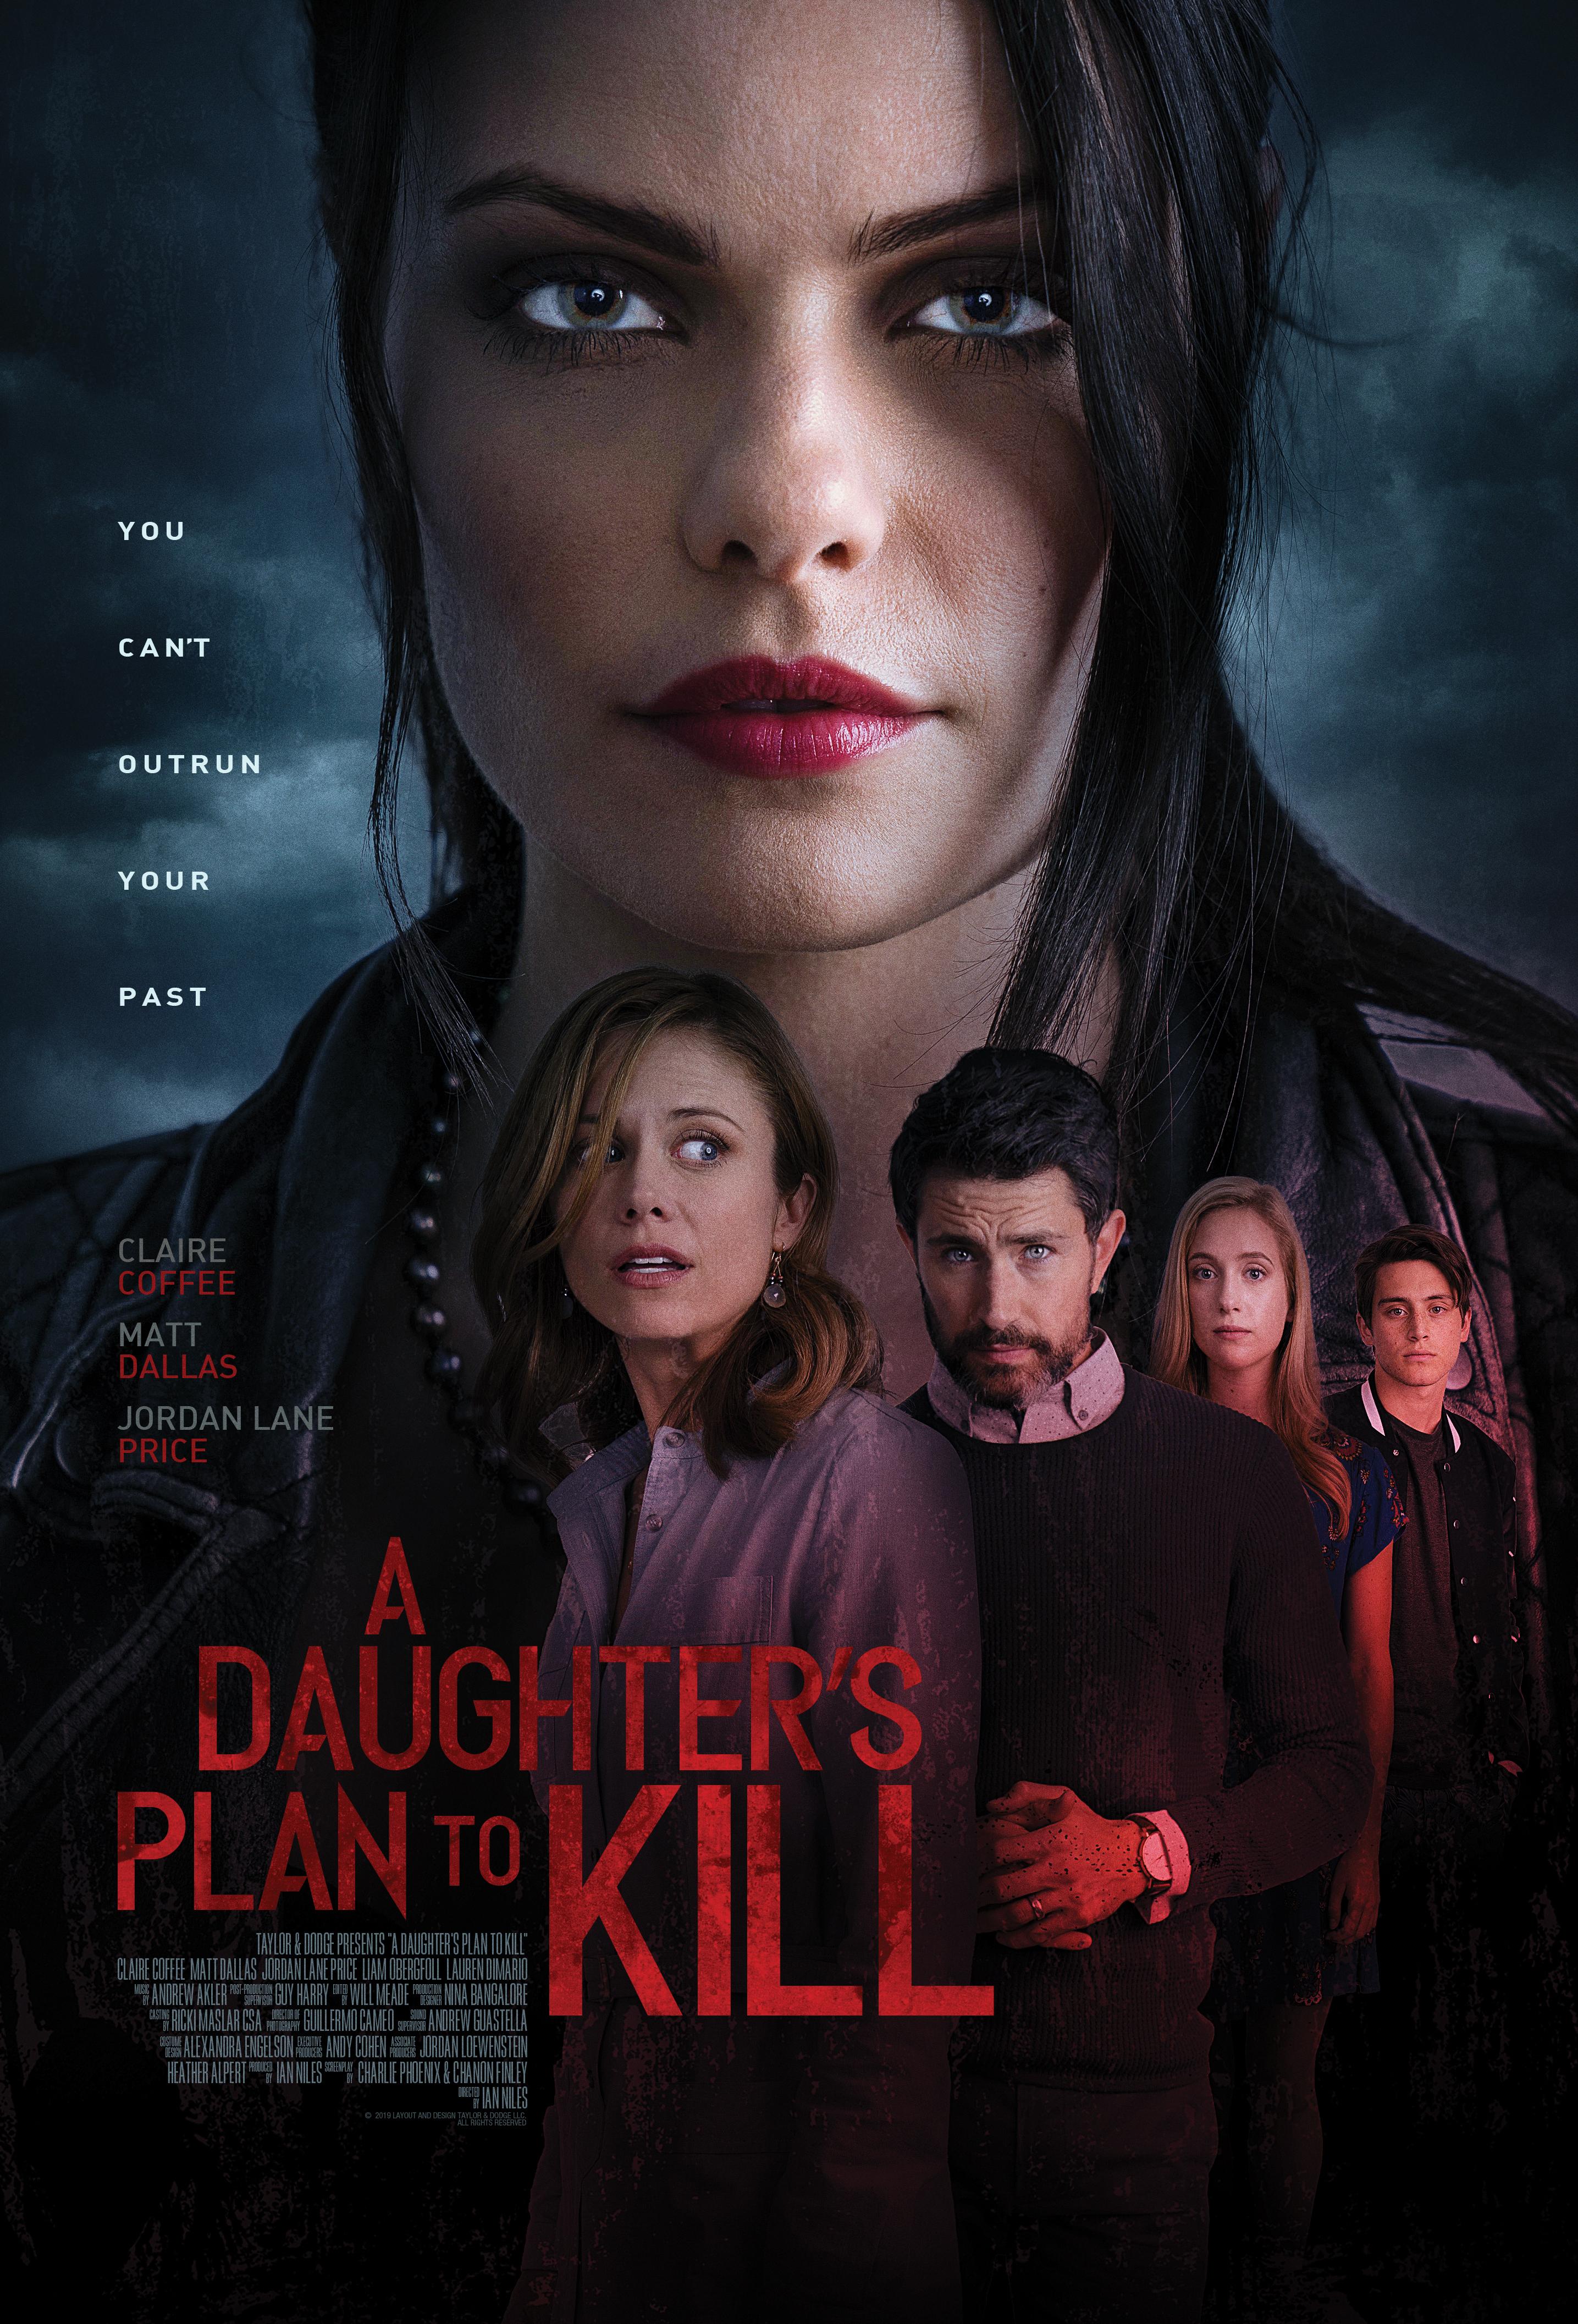 A Daughter's Plan to Kill kapak